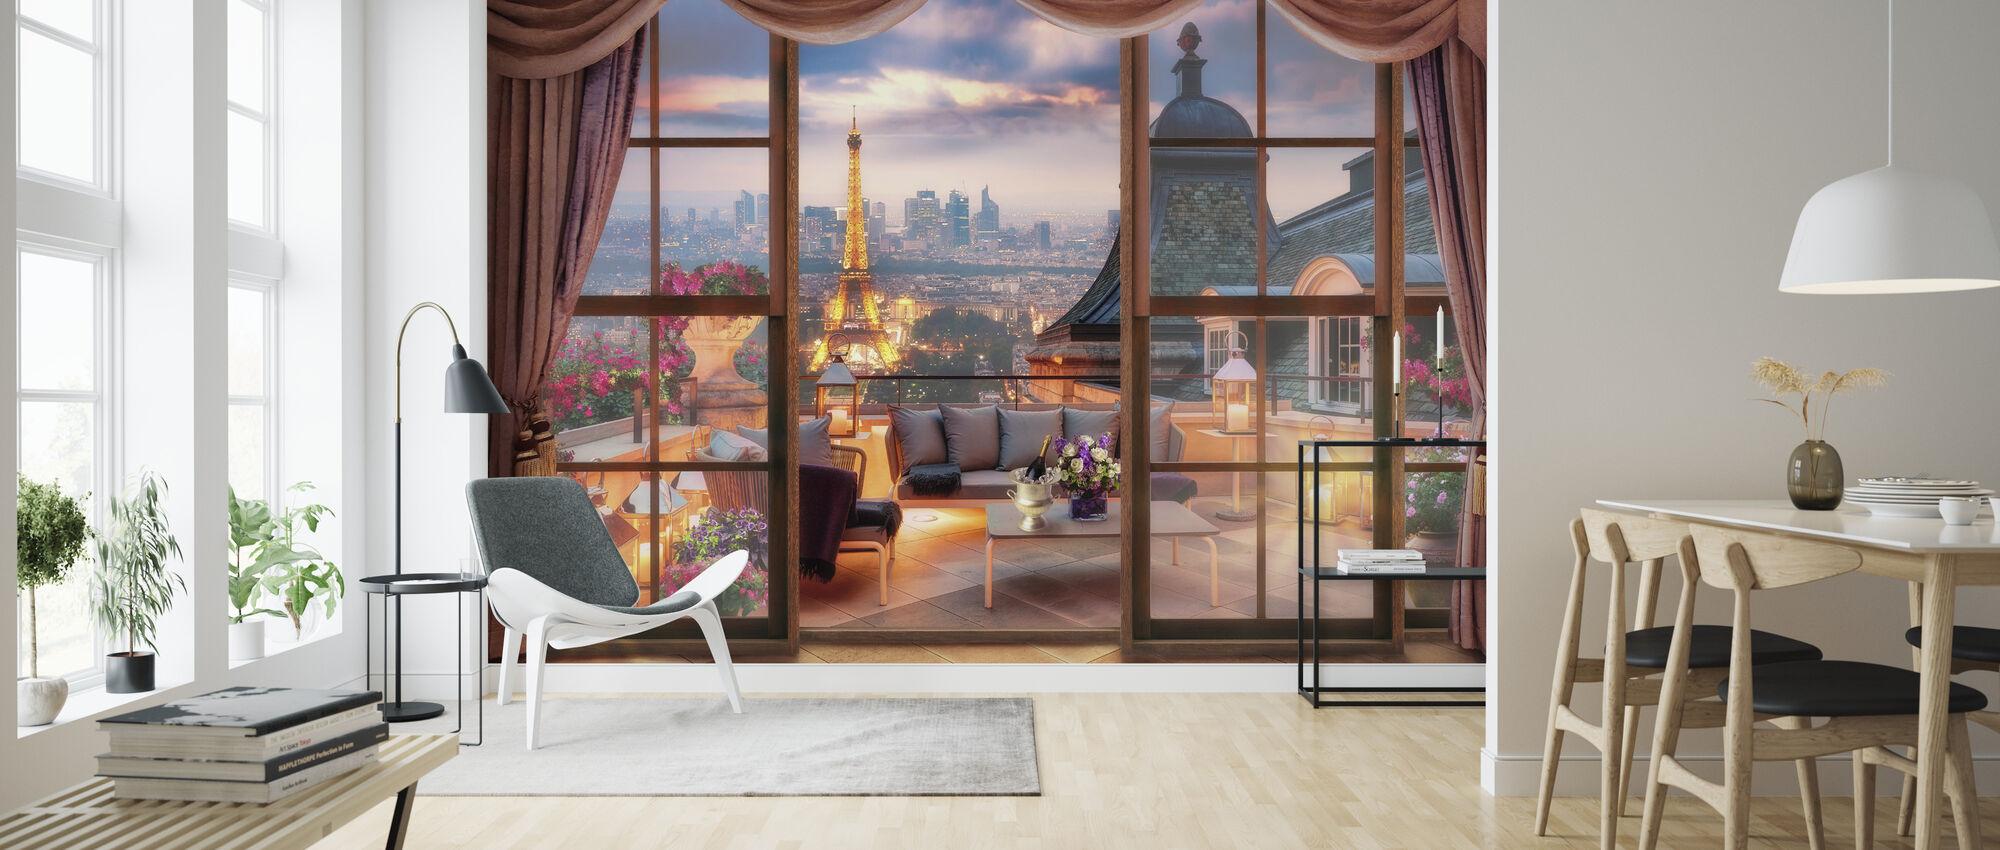 View over Paris - Wallpaper - Living Room